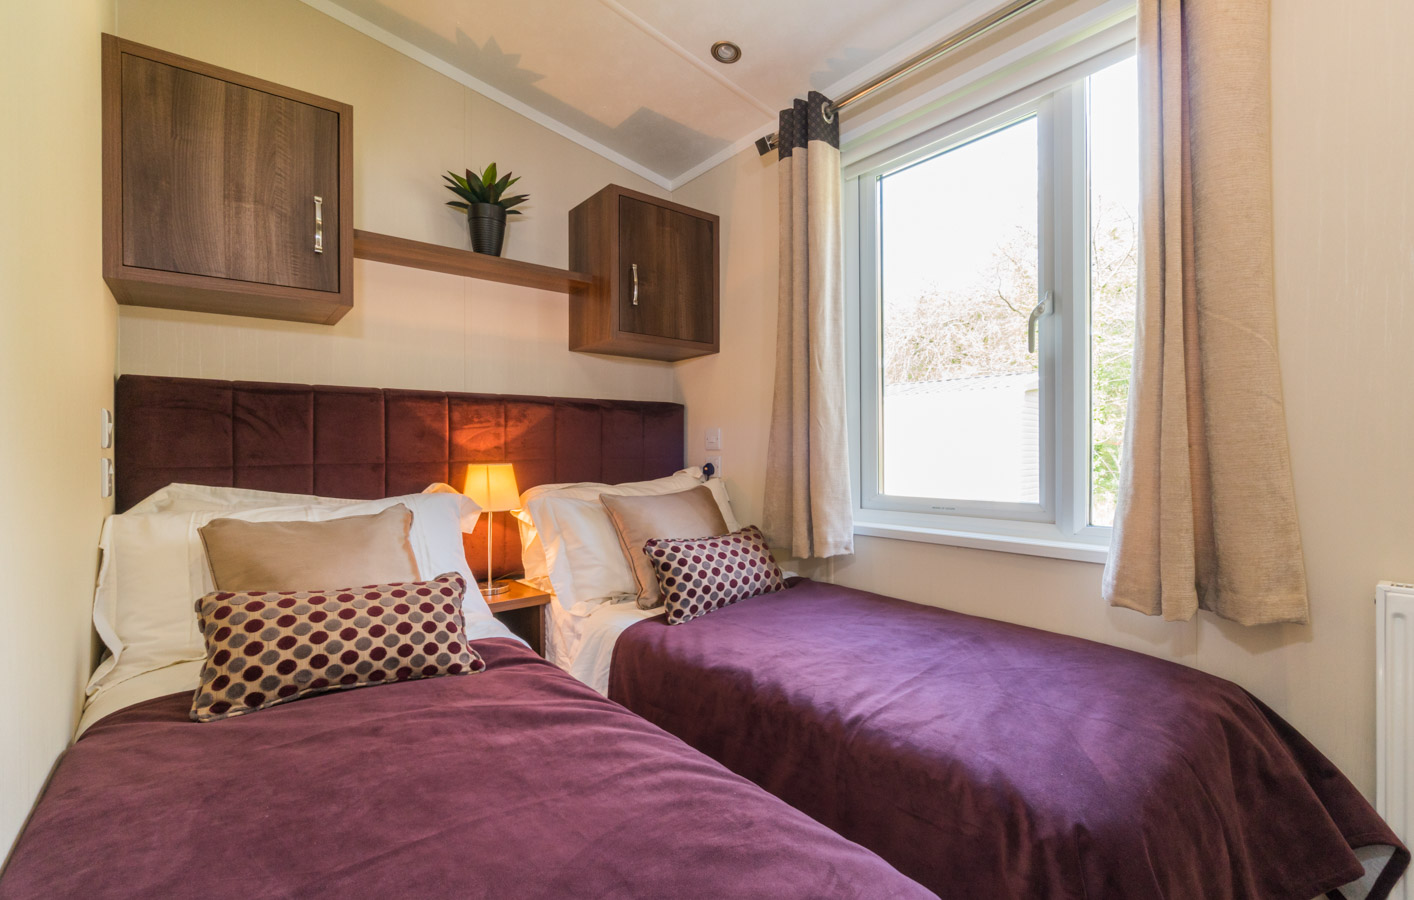 Neil-Bigwood-Monkton-Wyld-Holiday-Homes-55